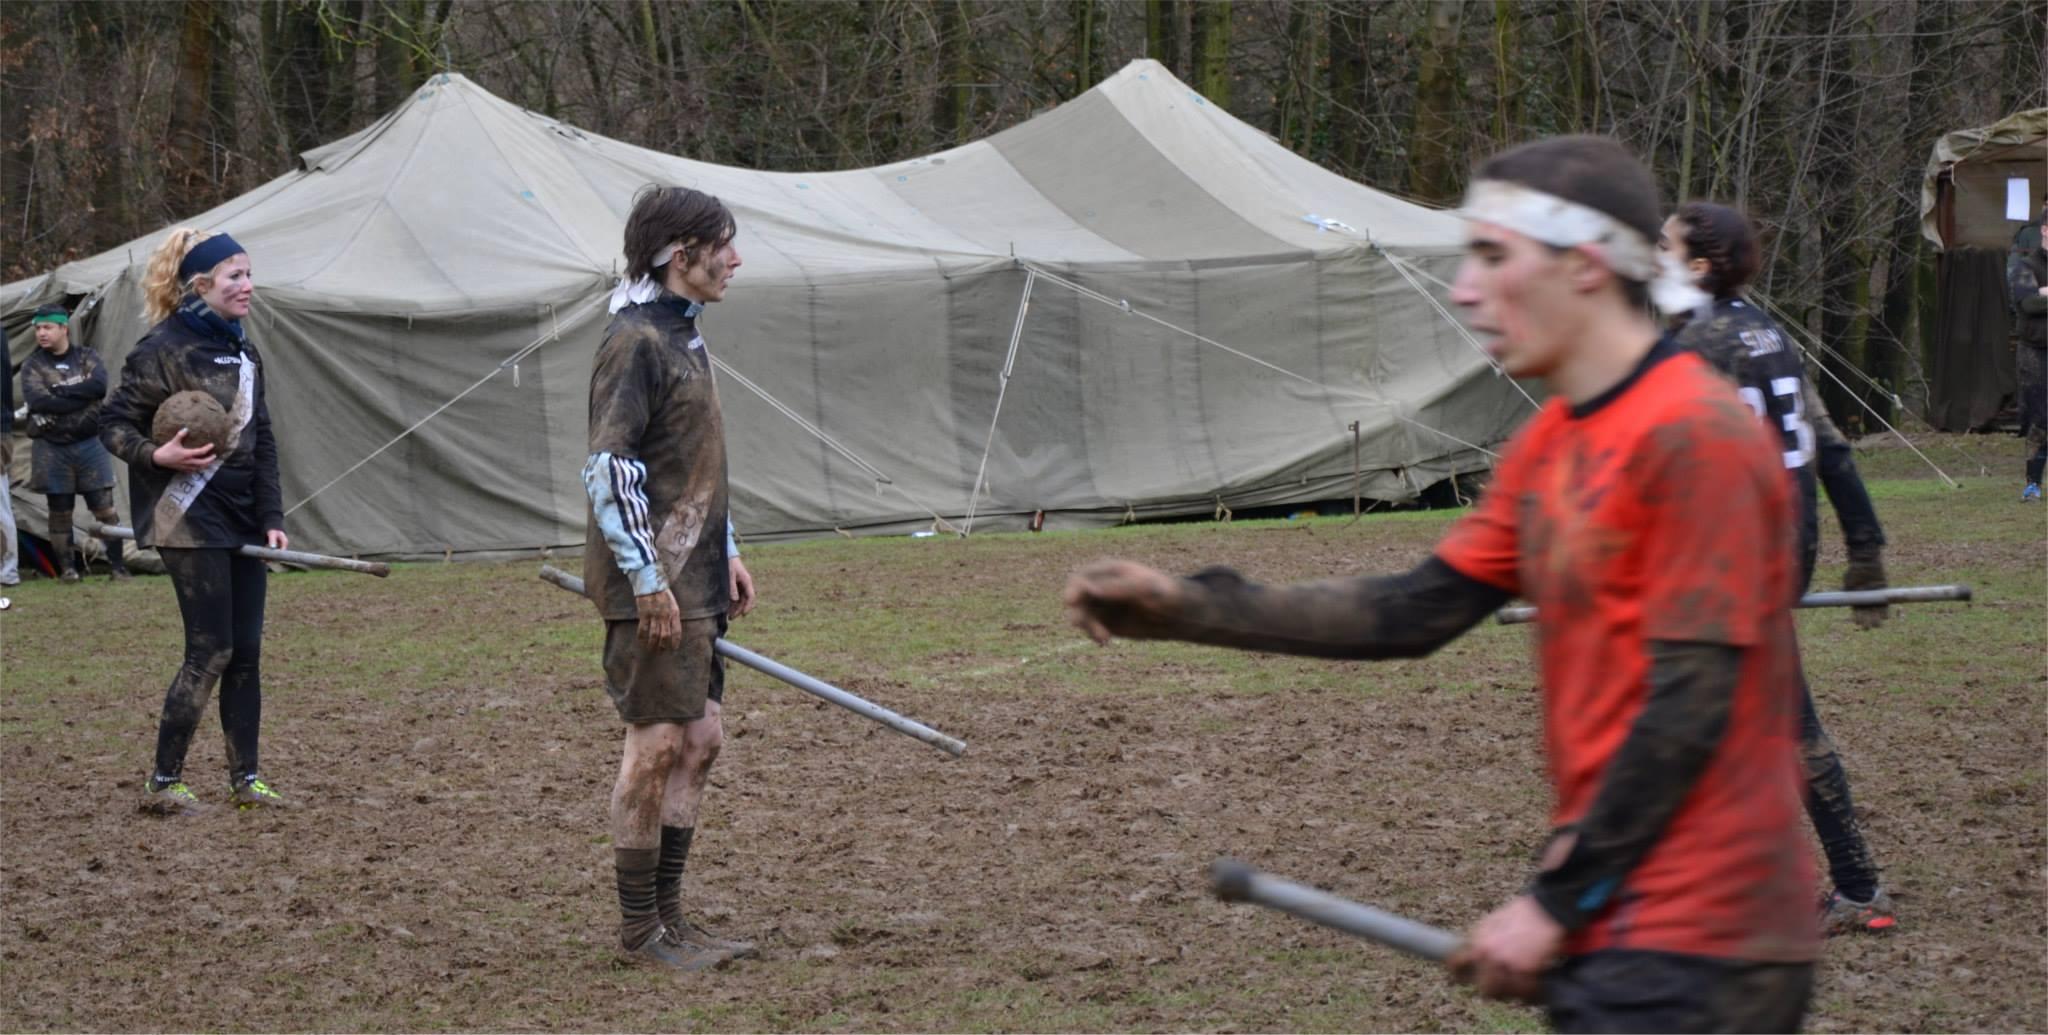 Championnat Européen de Quidditch ; bilan du week-end.